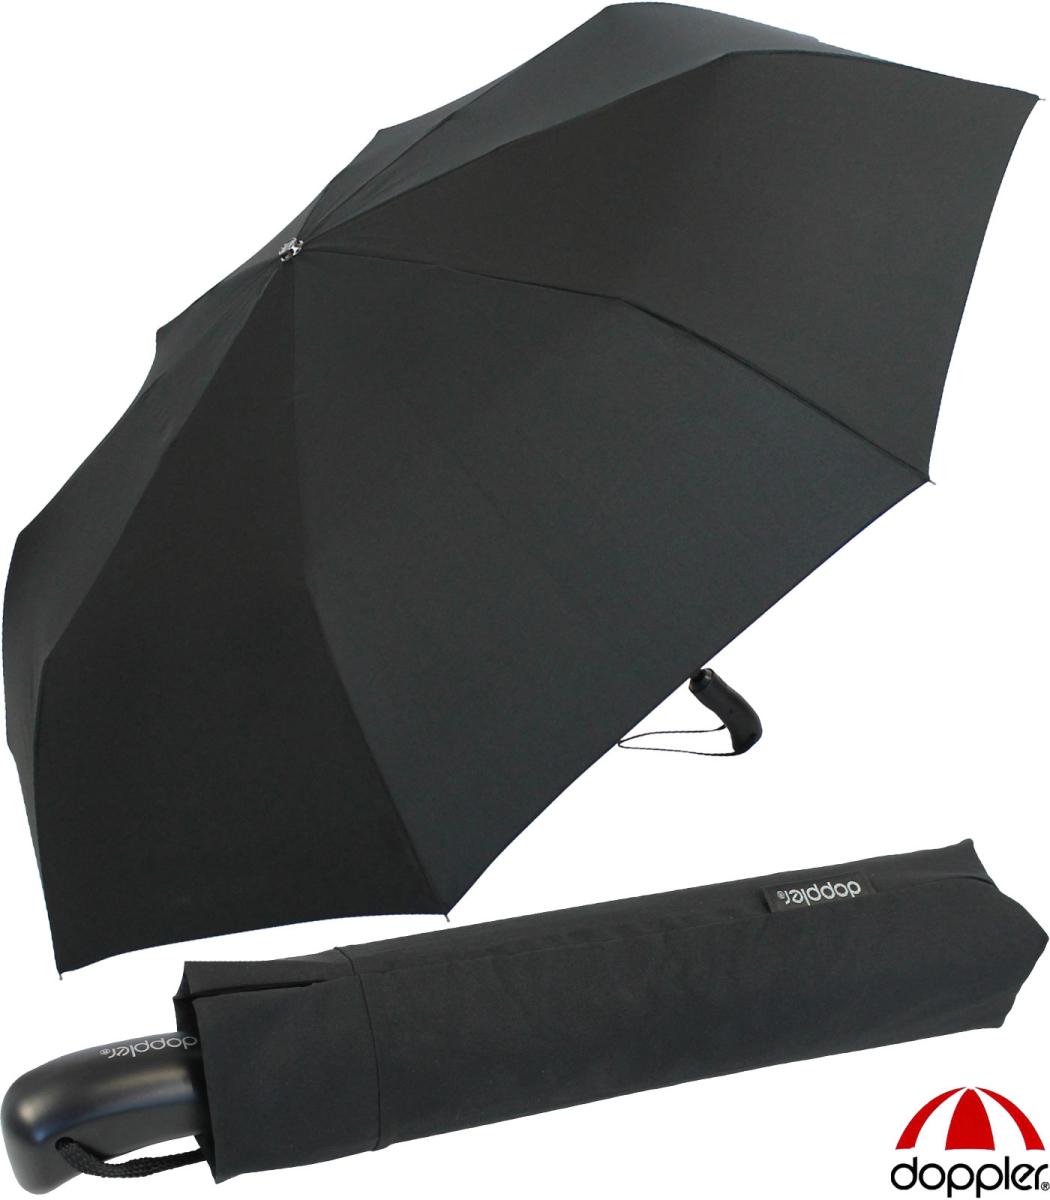 XXL Regenschirme und Partnerschirme - RS-Versand